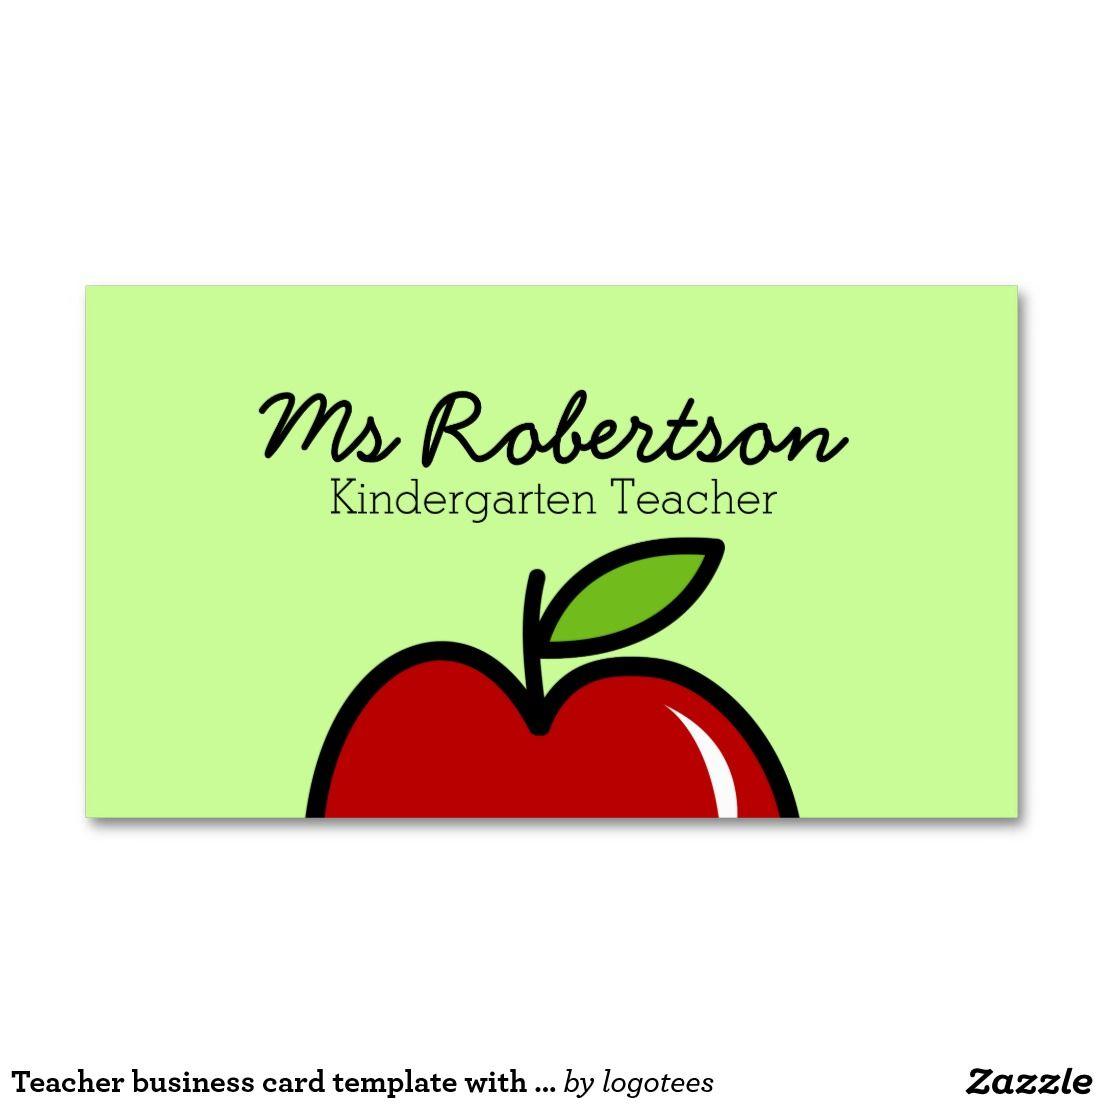 13 teacher business cards templates free 1 business card 13 teacher business cards templates free 1 business card fbccfo Choice Image